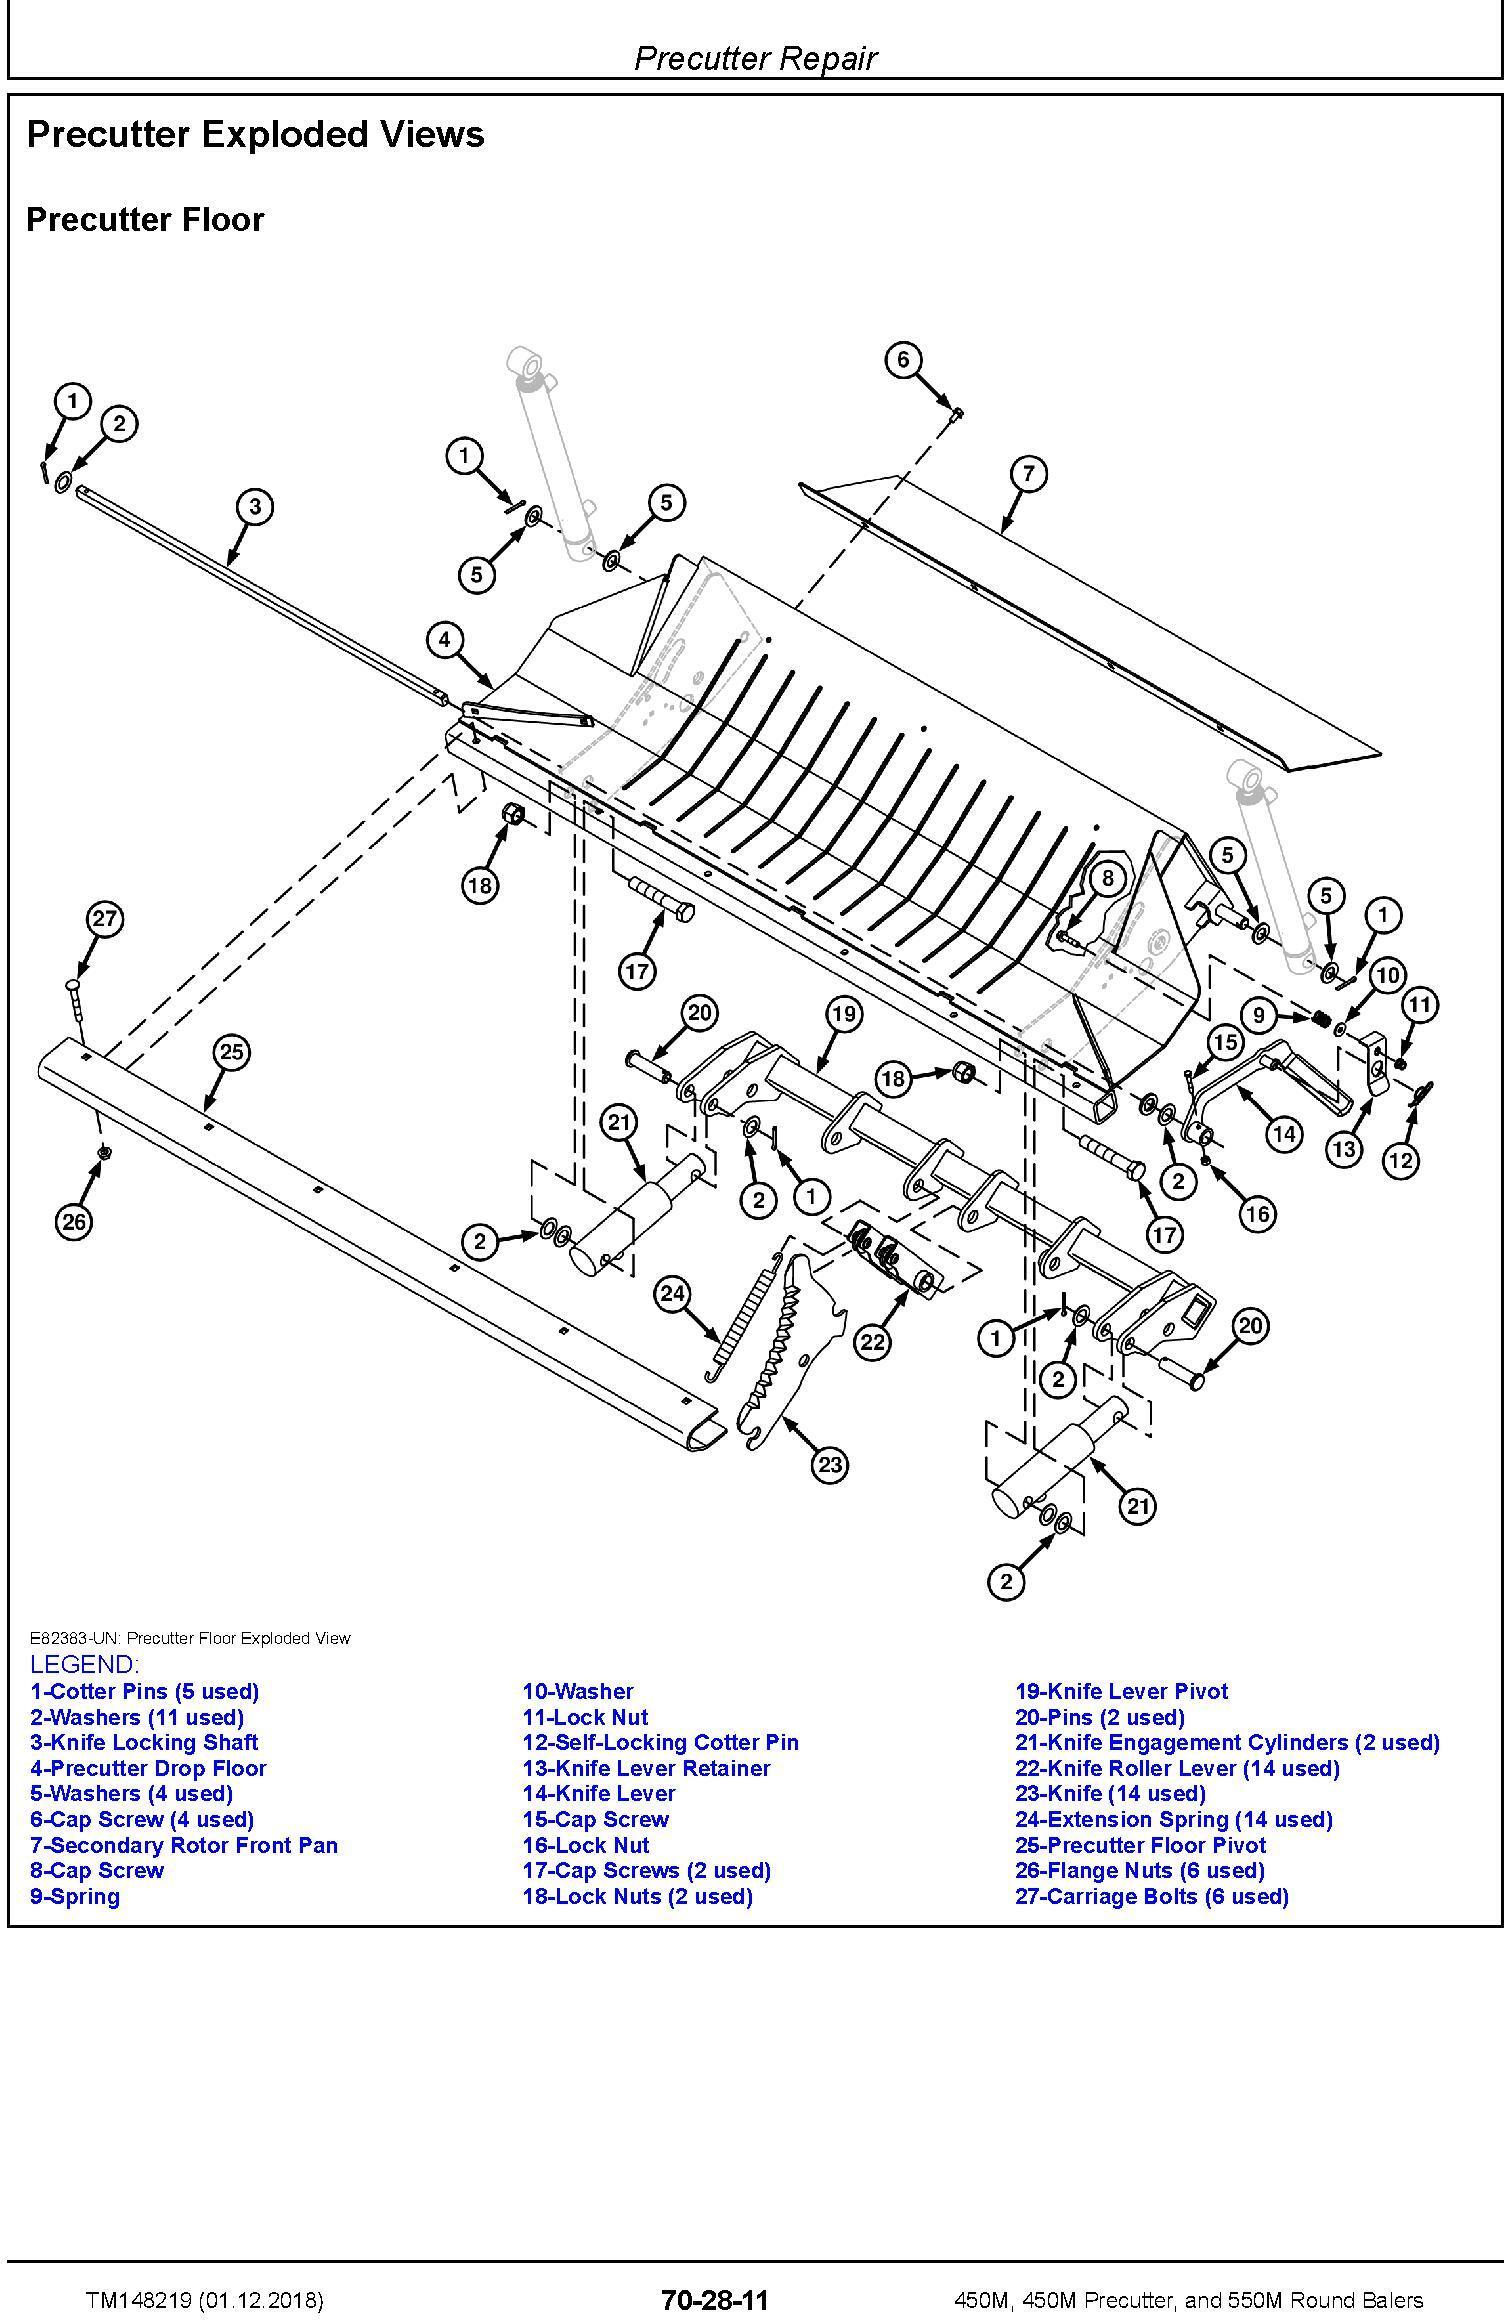 John Deere 450M, 450M Precutter, and 550M Round Balers Technical Service Manual (TM148219) - 2